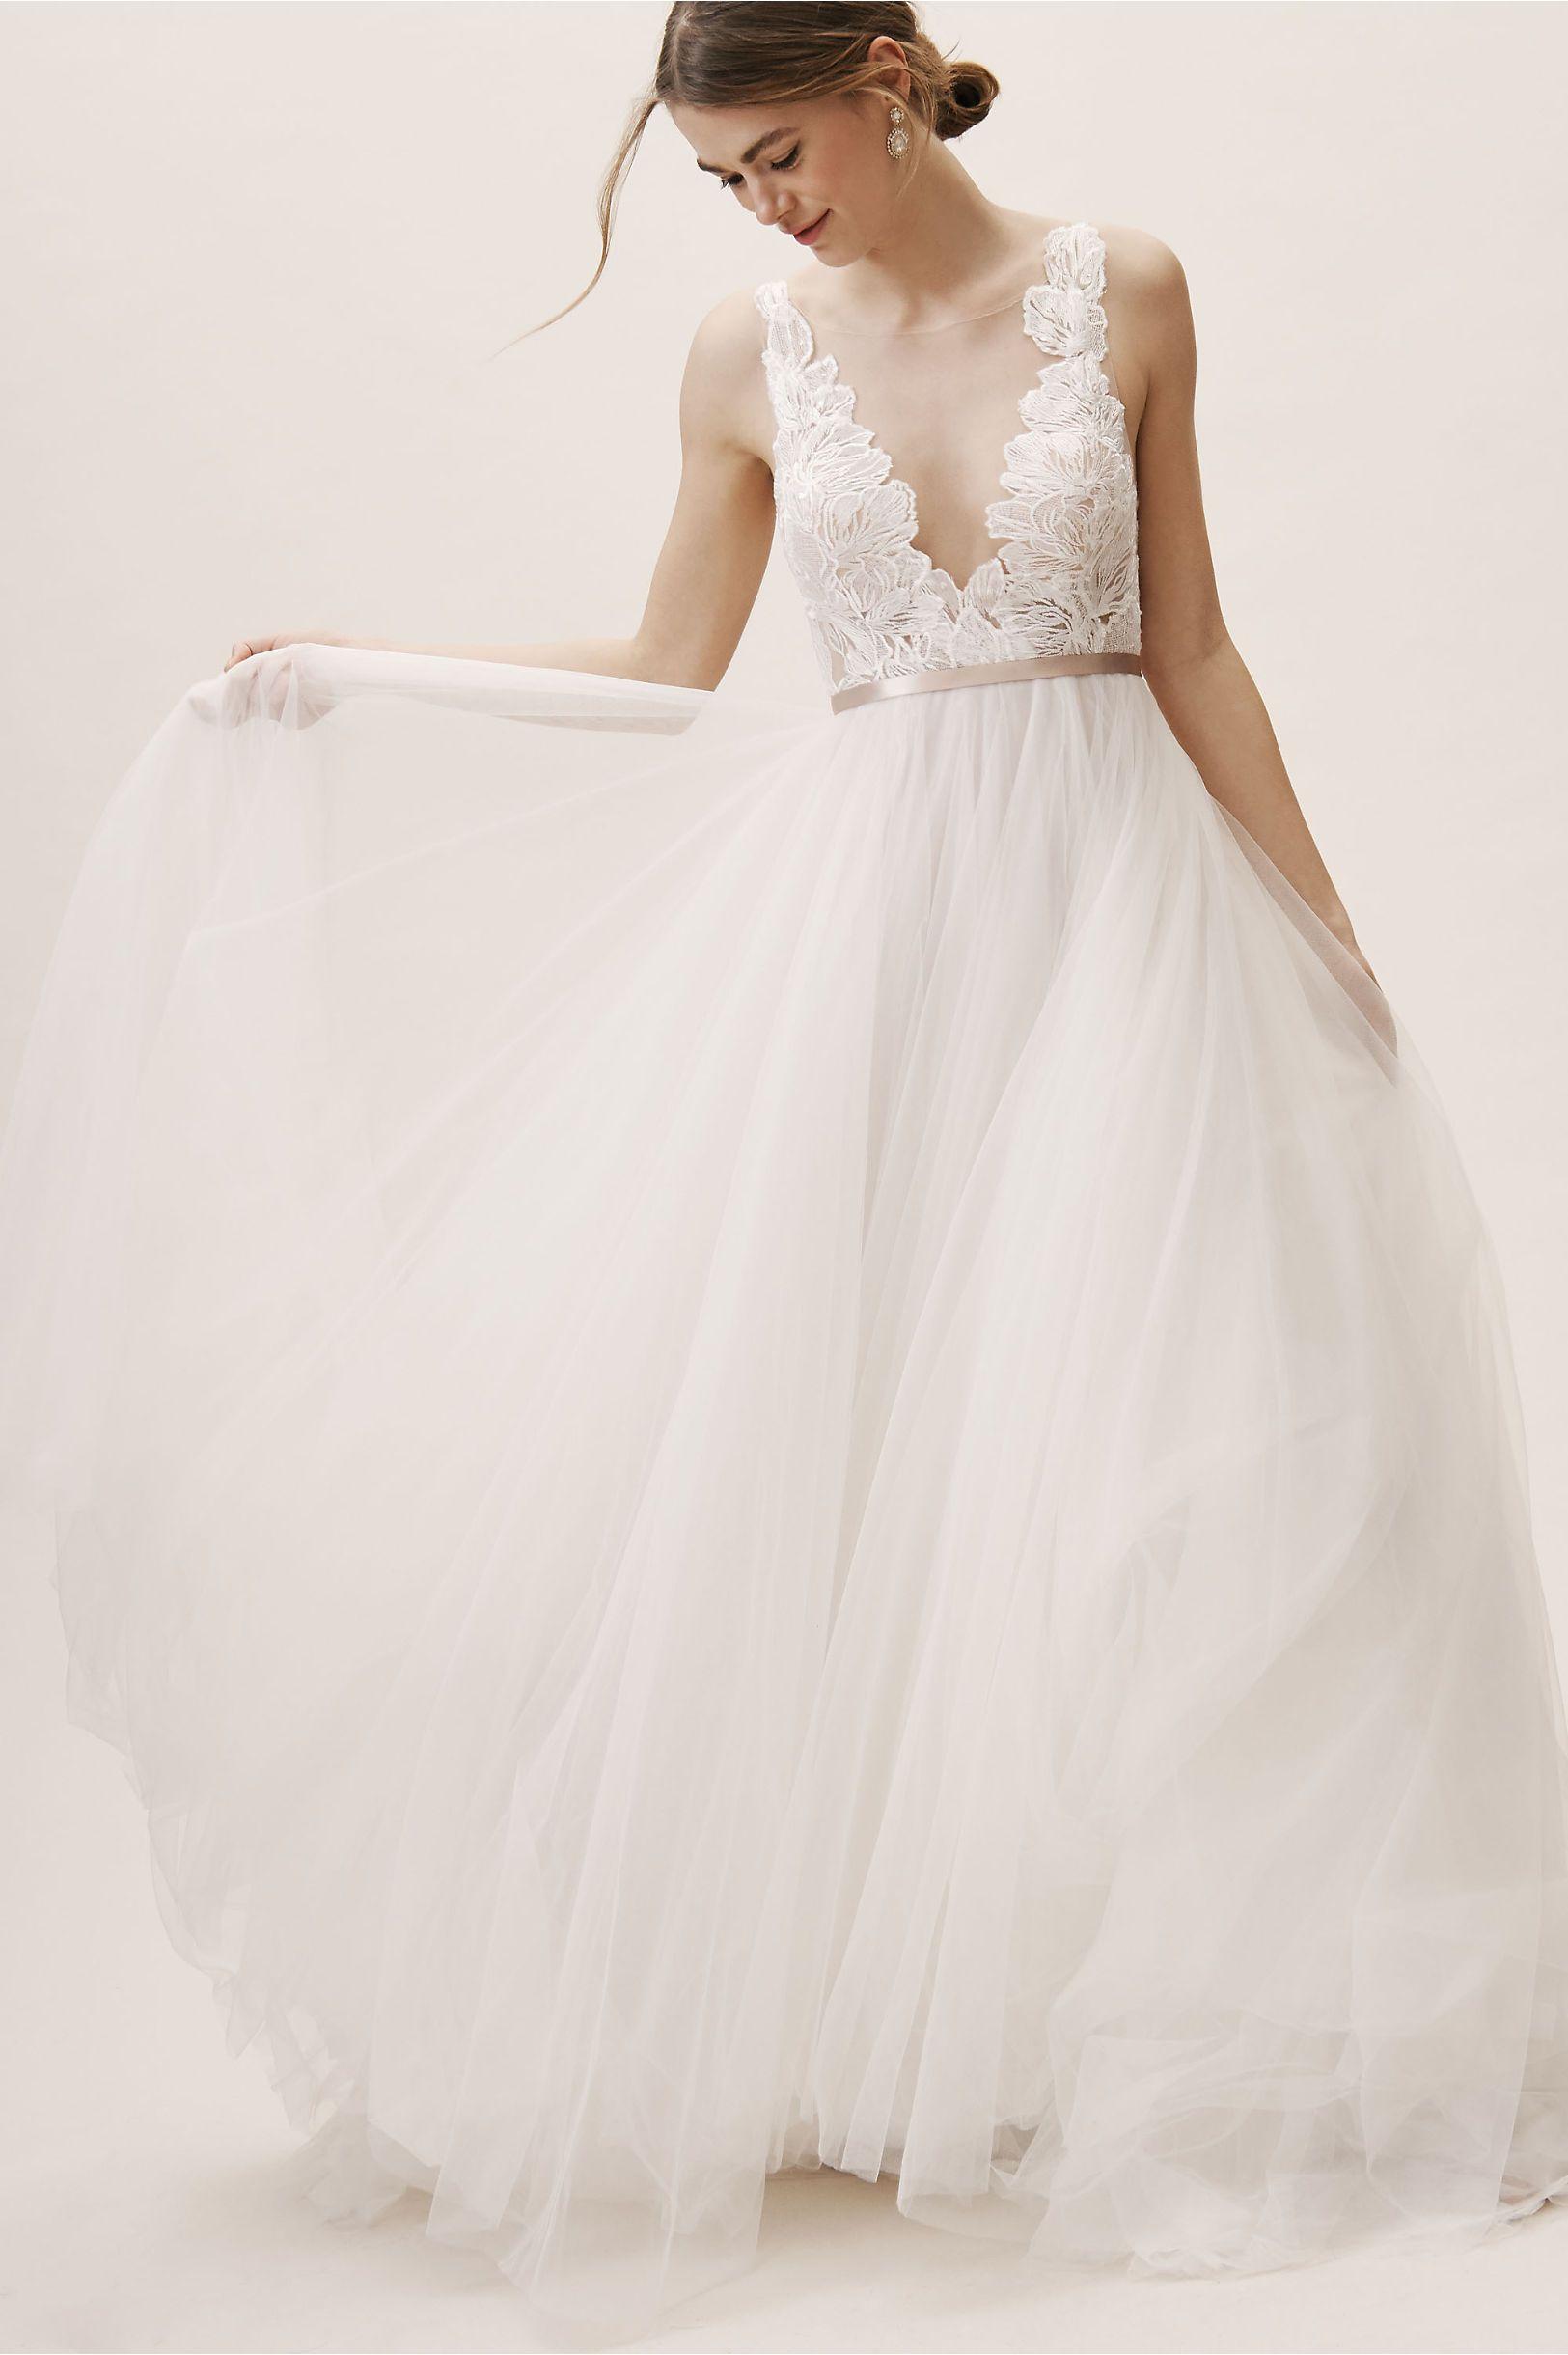 Wtoo By Watters Lange Gown In 2020 Wedding Dresses Lace Wtoo Wedding Dress Wedding Dresses